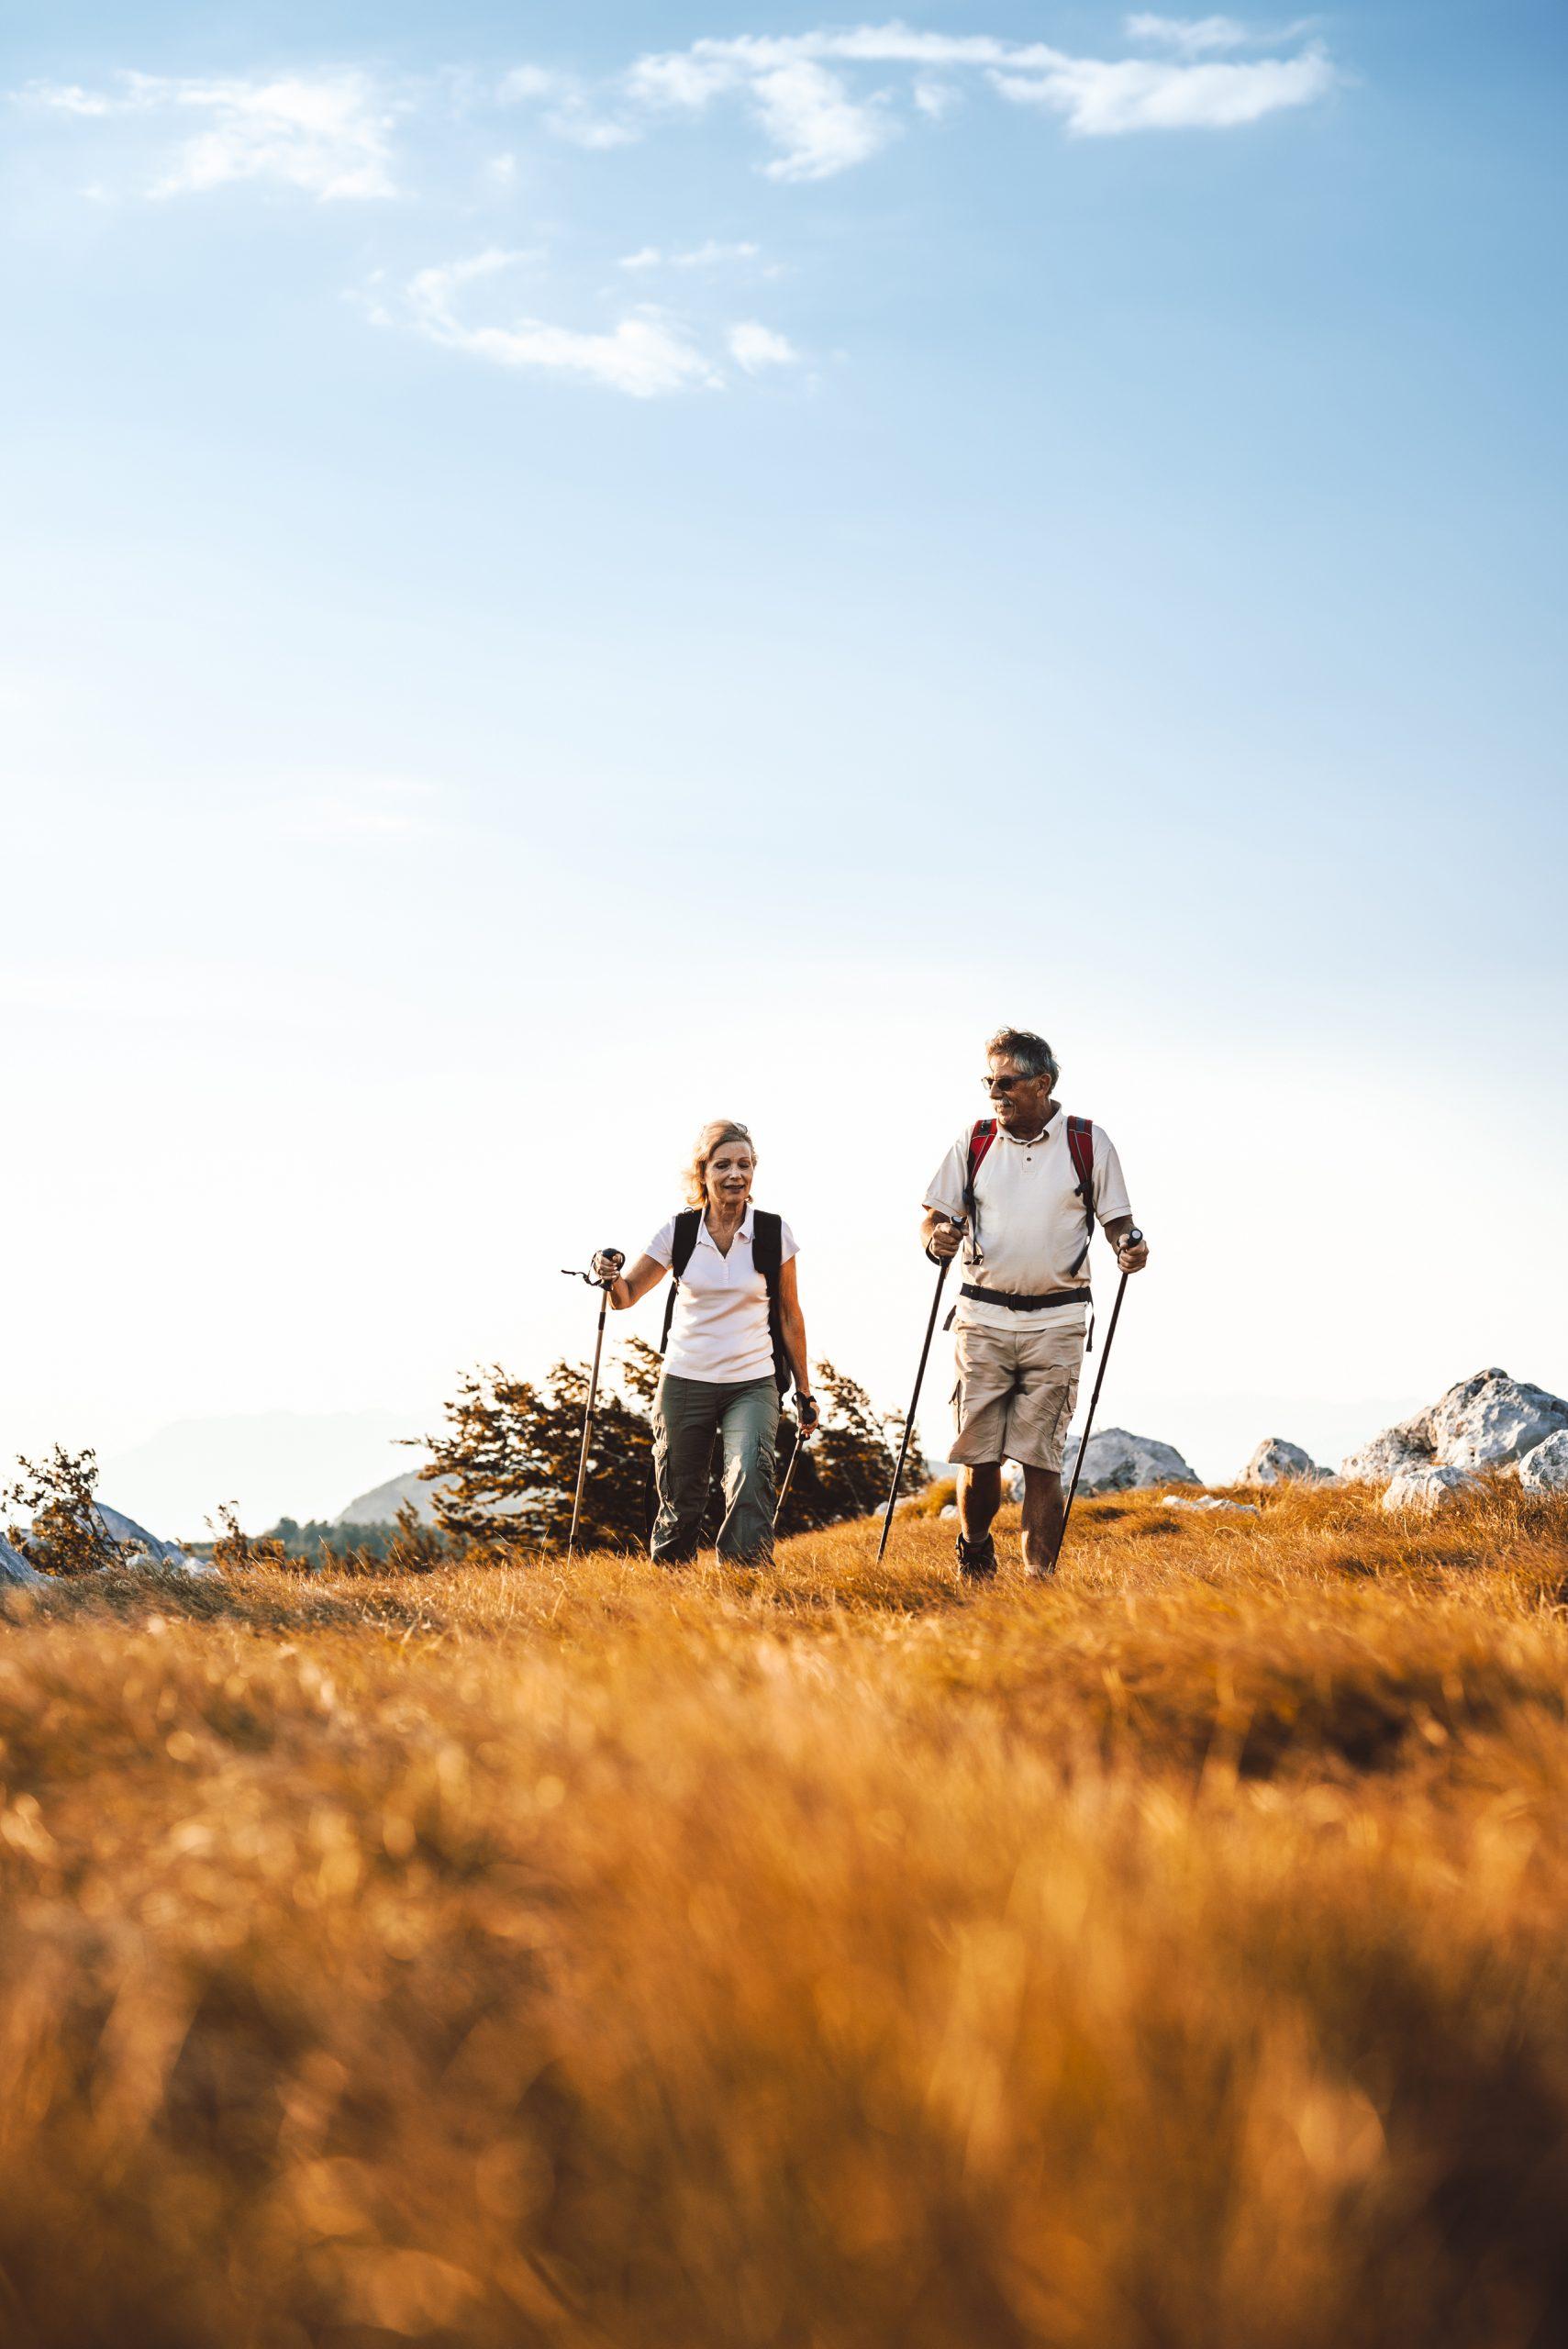 Heterosexual senior couple hiking